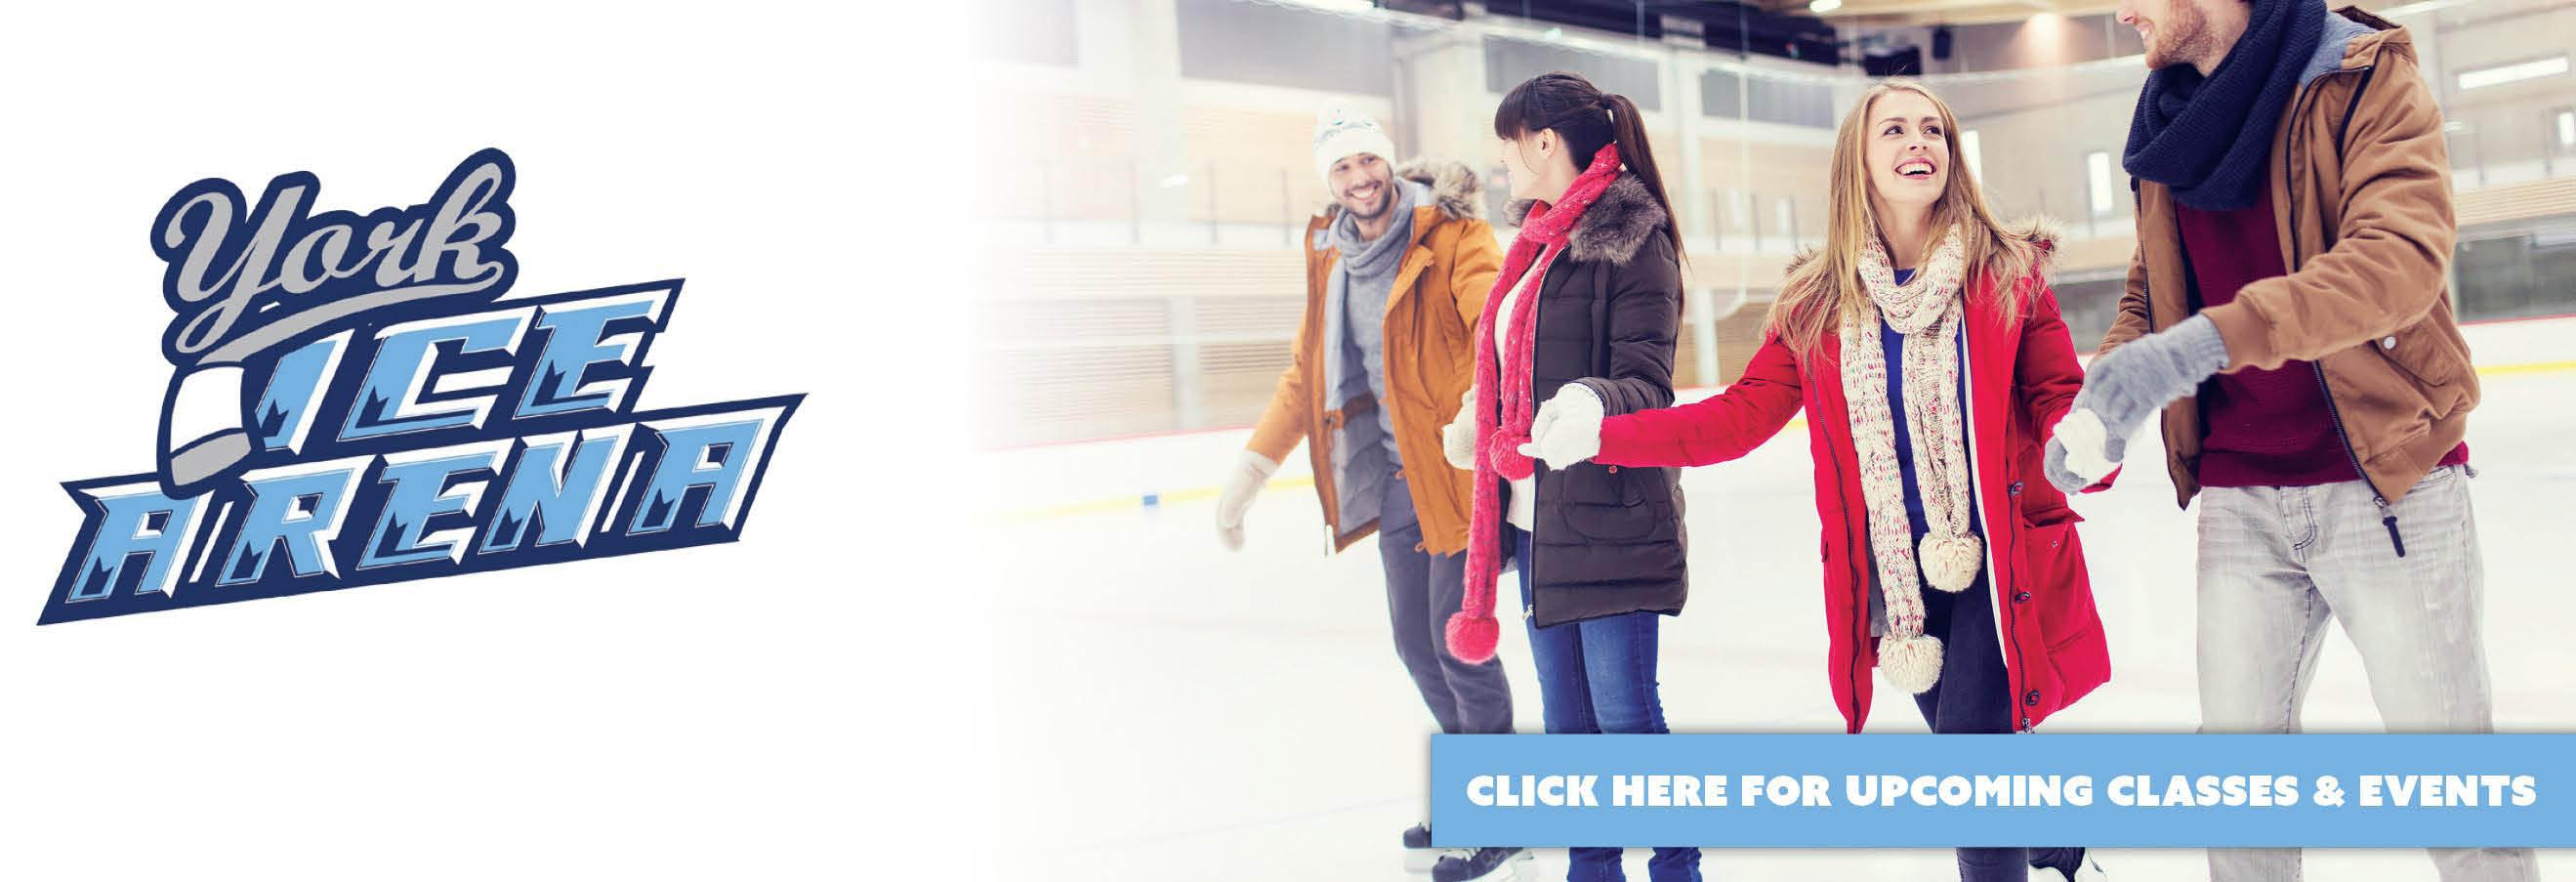 York, City, Ice, Arena, Lessons, Winter, Summer, Hockey, Tournament, Skates, Skating